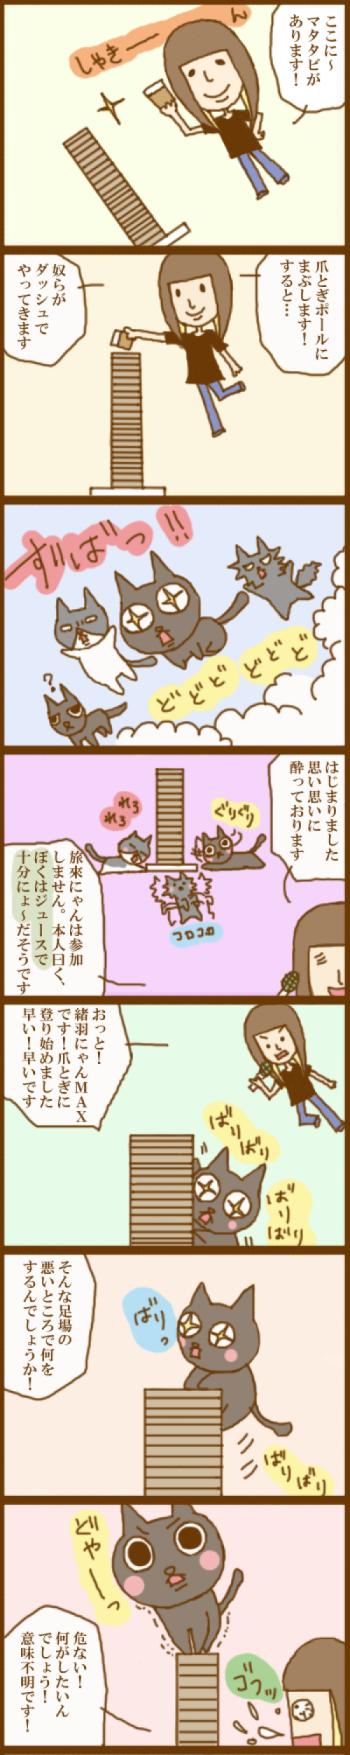 f:id:suzuokayu:20201119101237j:plain